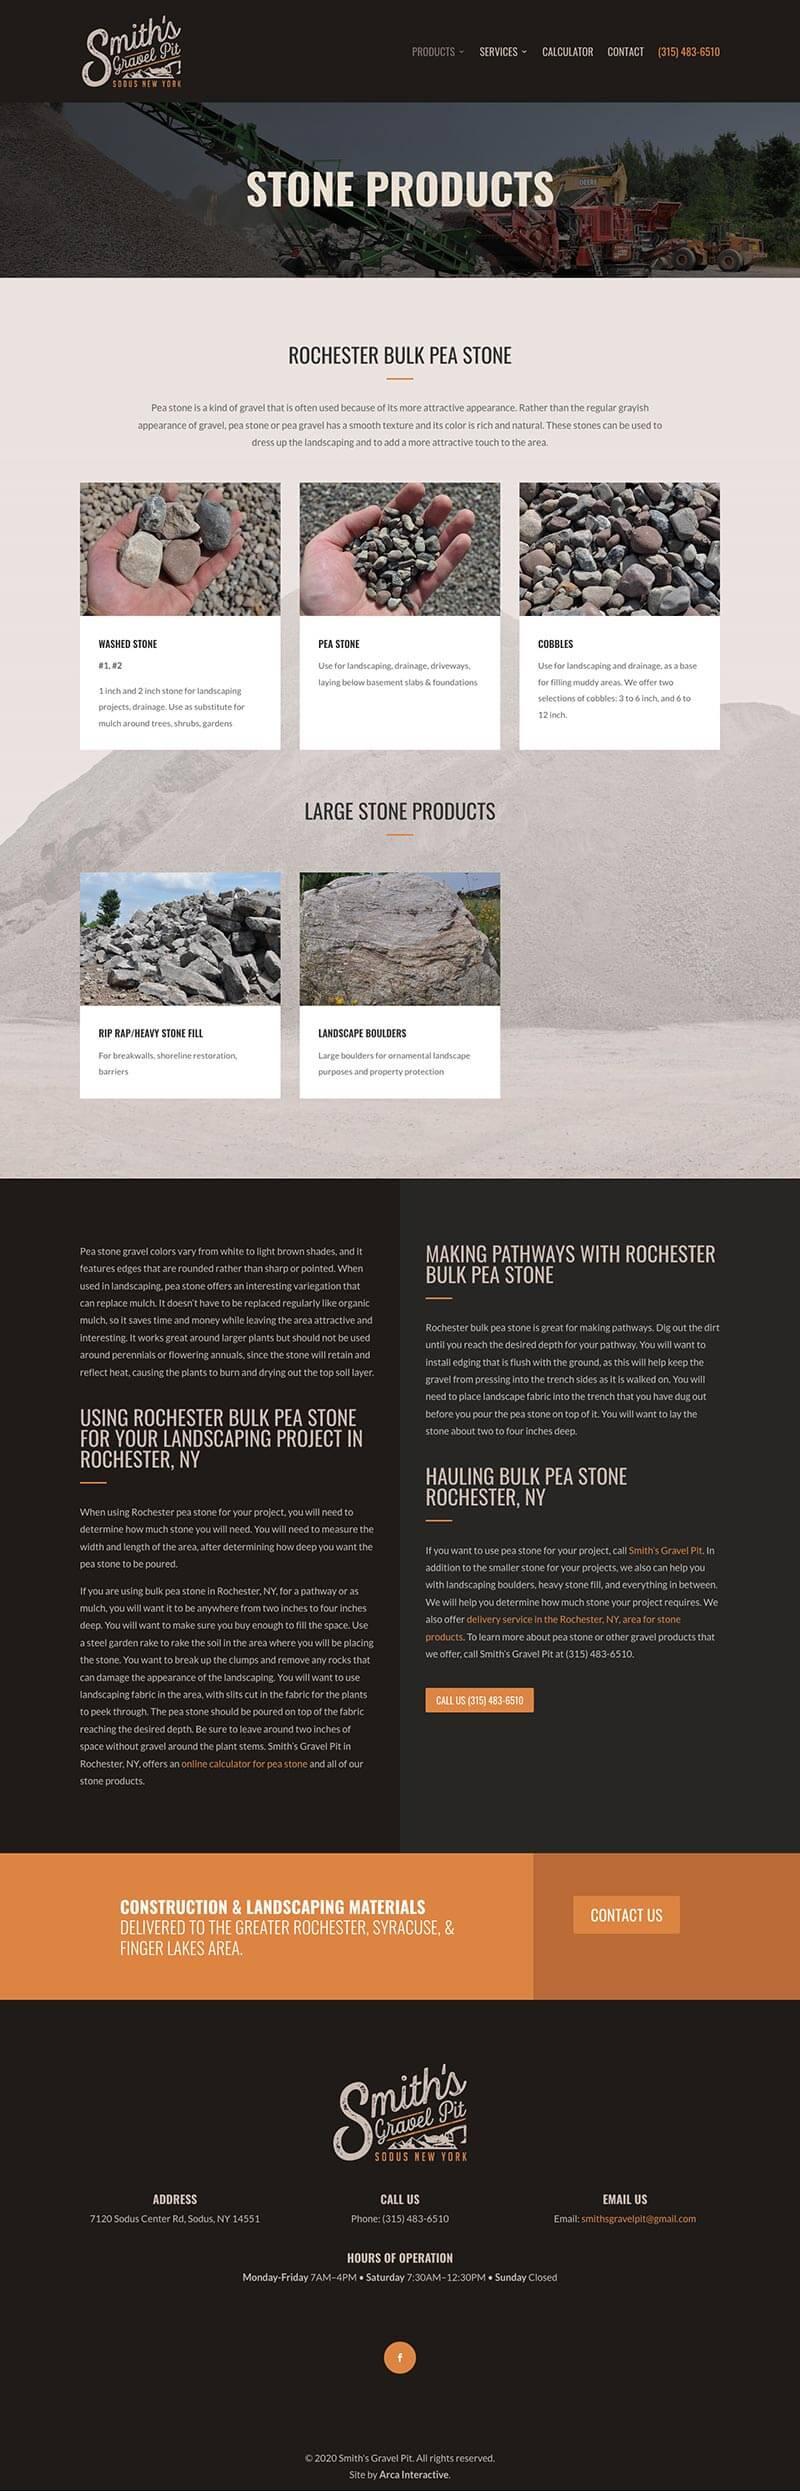 Smiths Gravel Pit Web Design